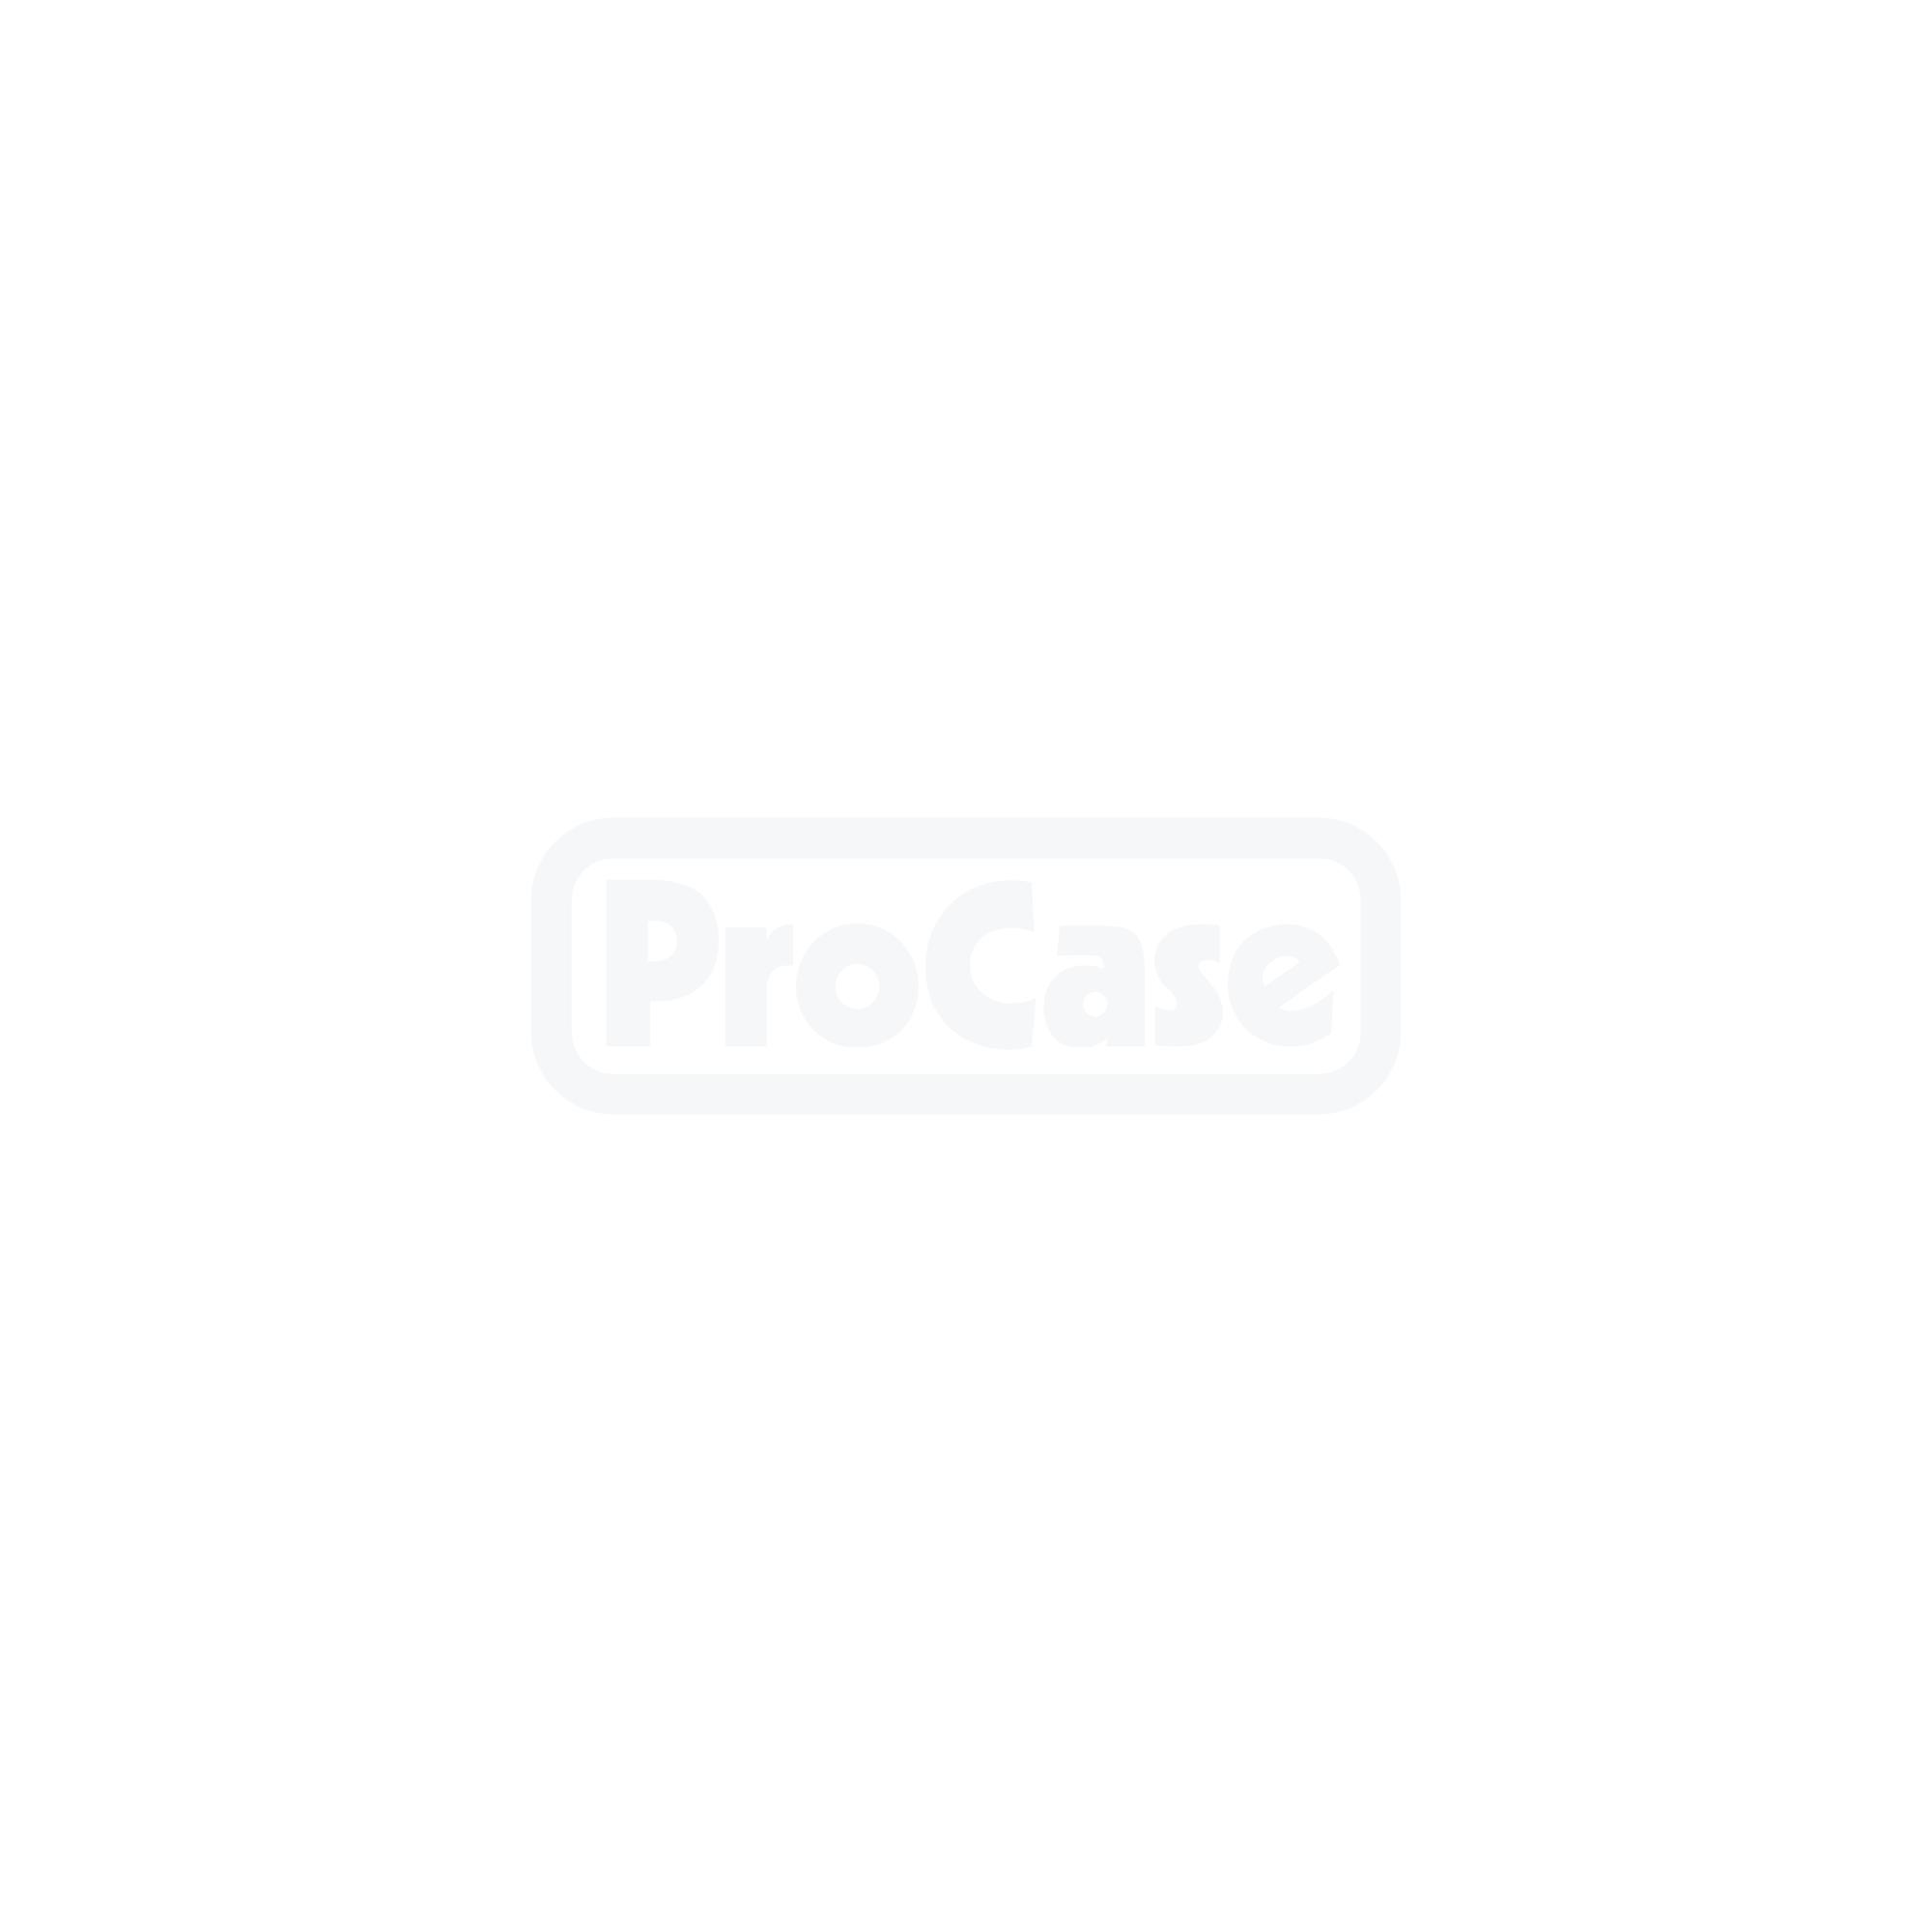 SKB 3i Koffer 2424-14B mit Rasterschaumstoff